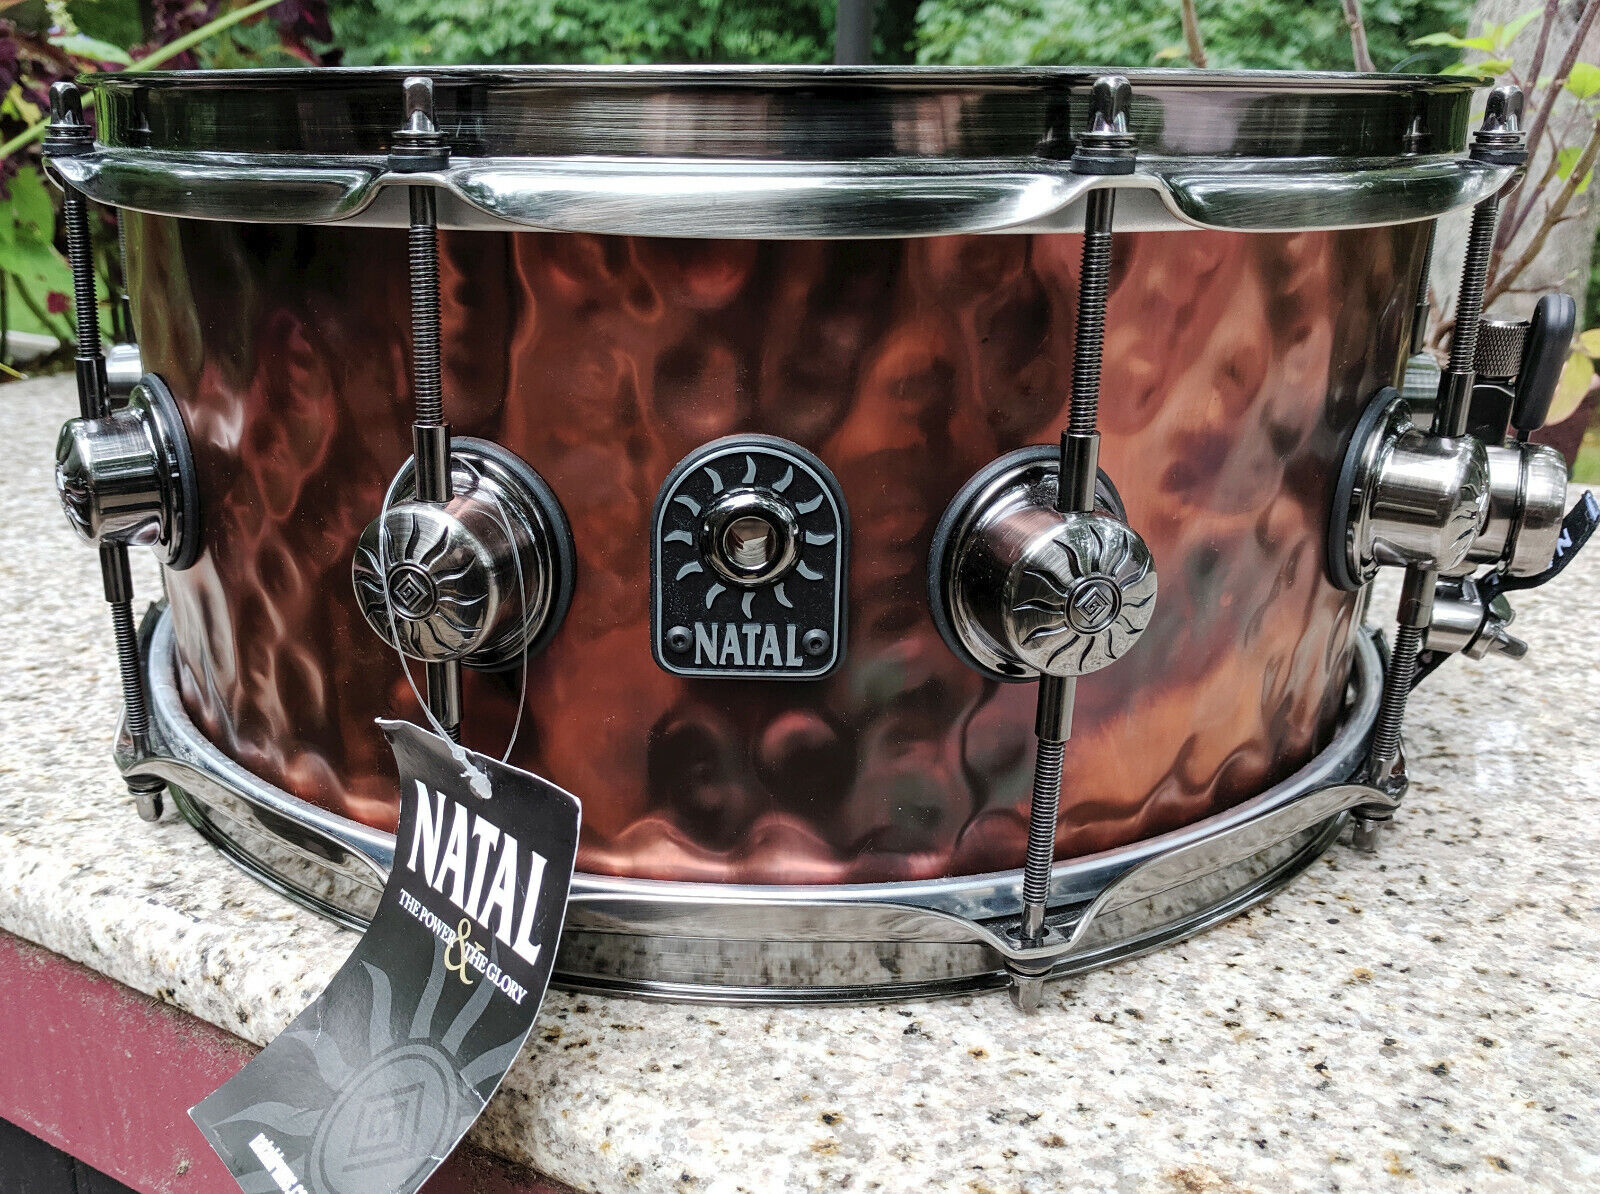 NOS Natal Hand-hammerot 14x6.5  Steel Snare Old Bronze Finish Brushed Nickel HW